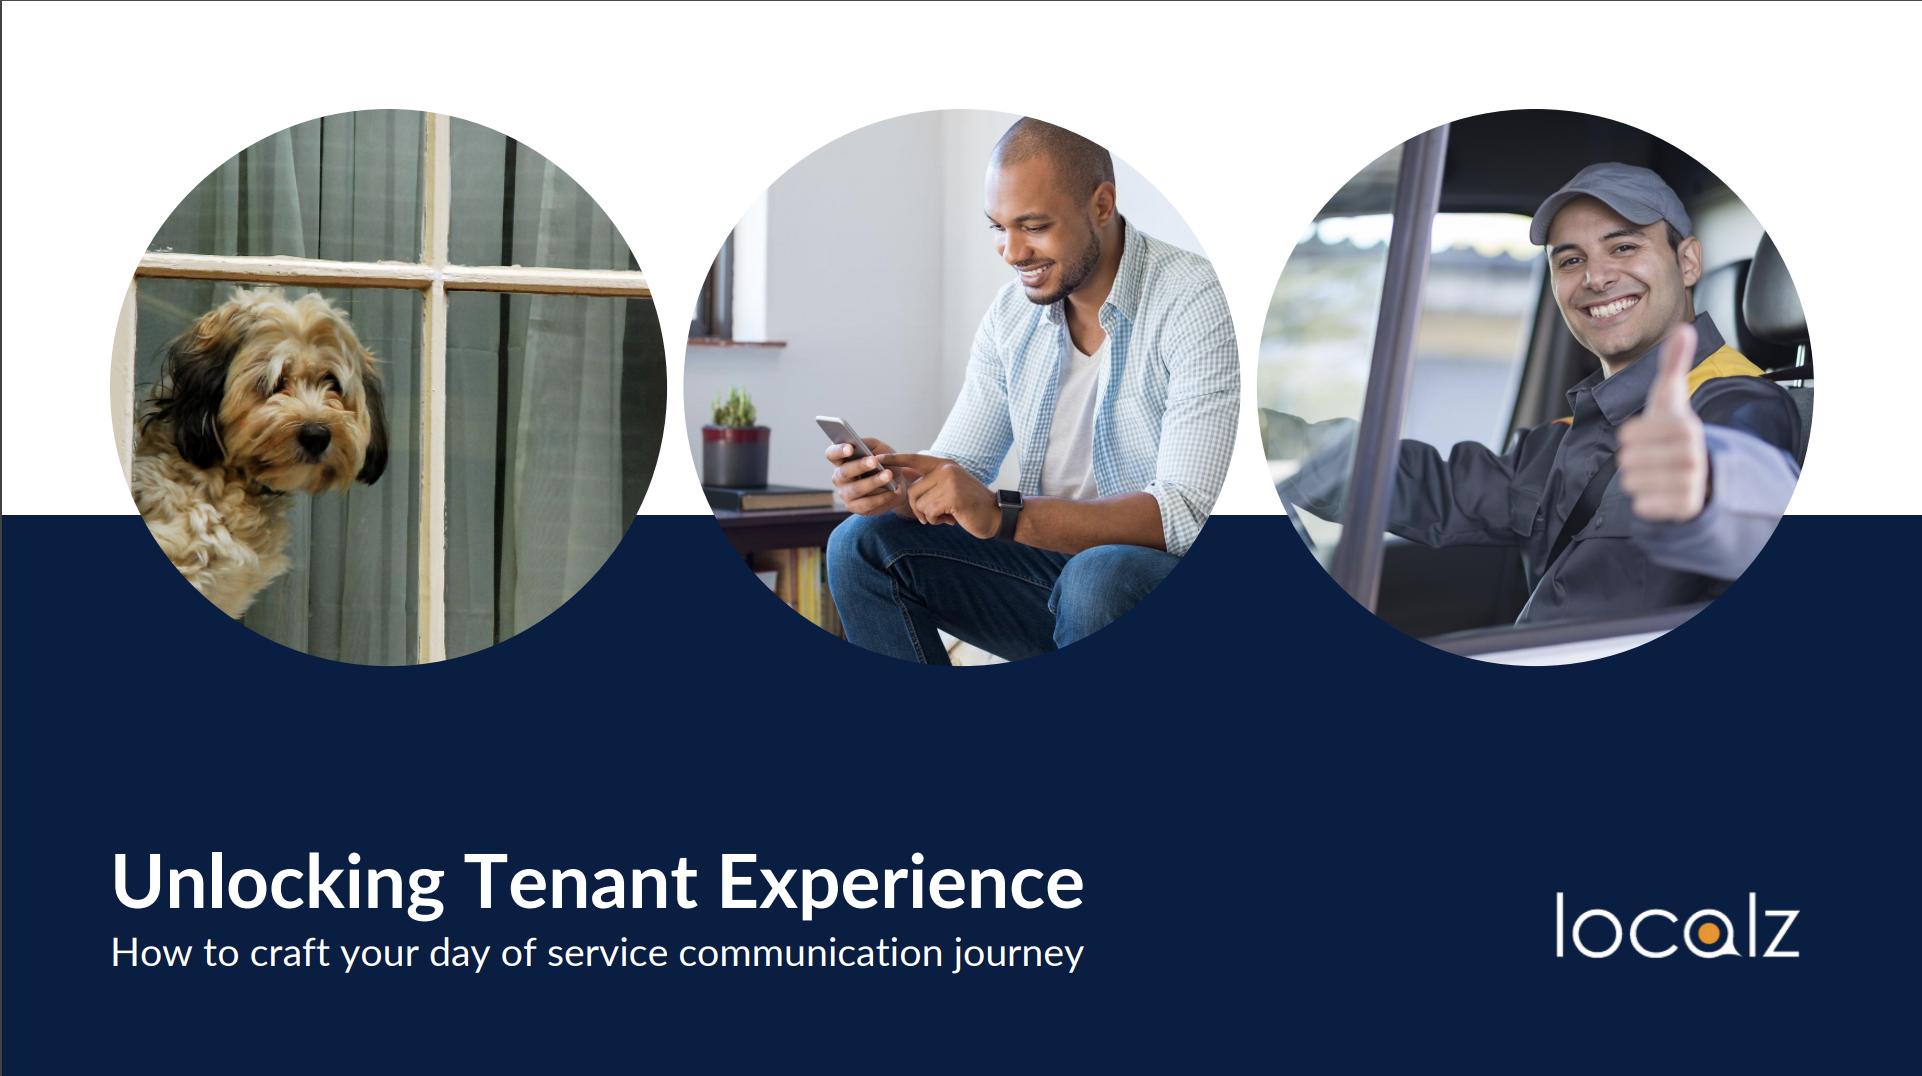 unlocking tenant experience